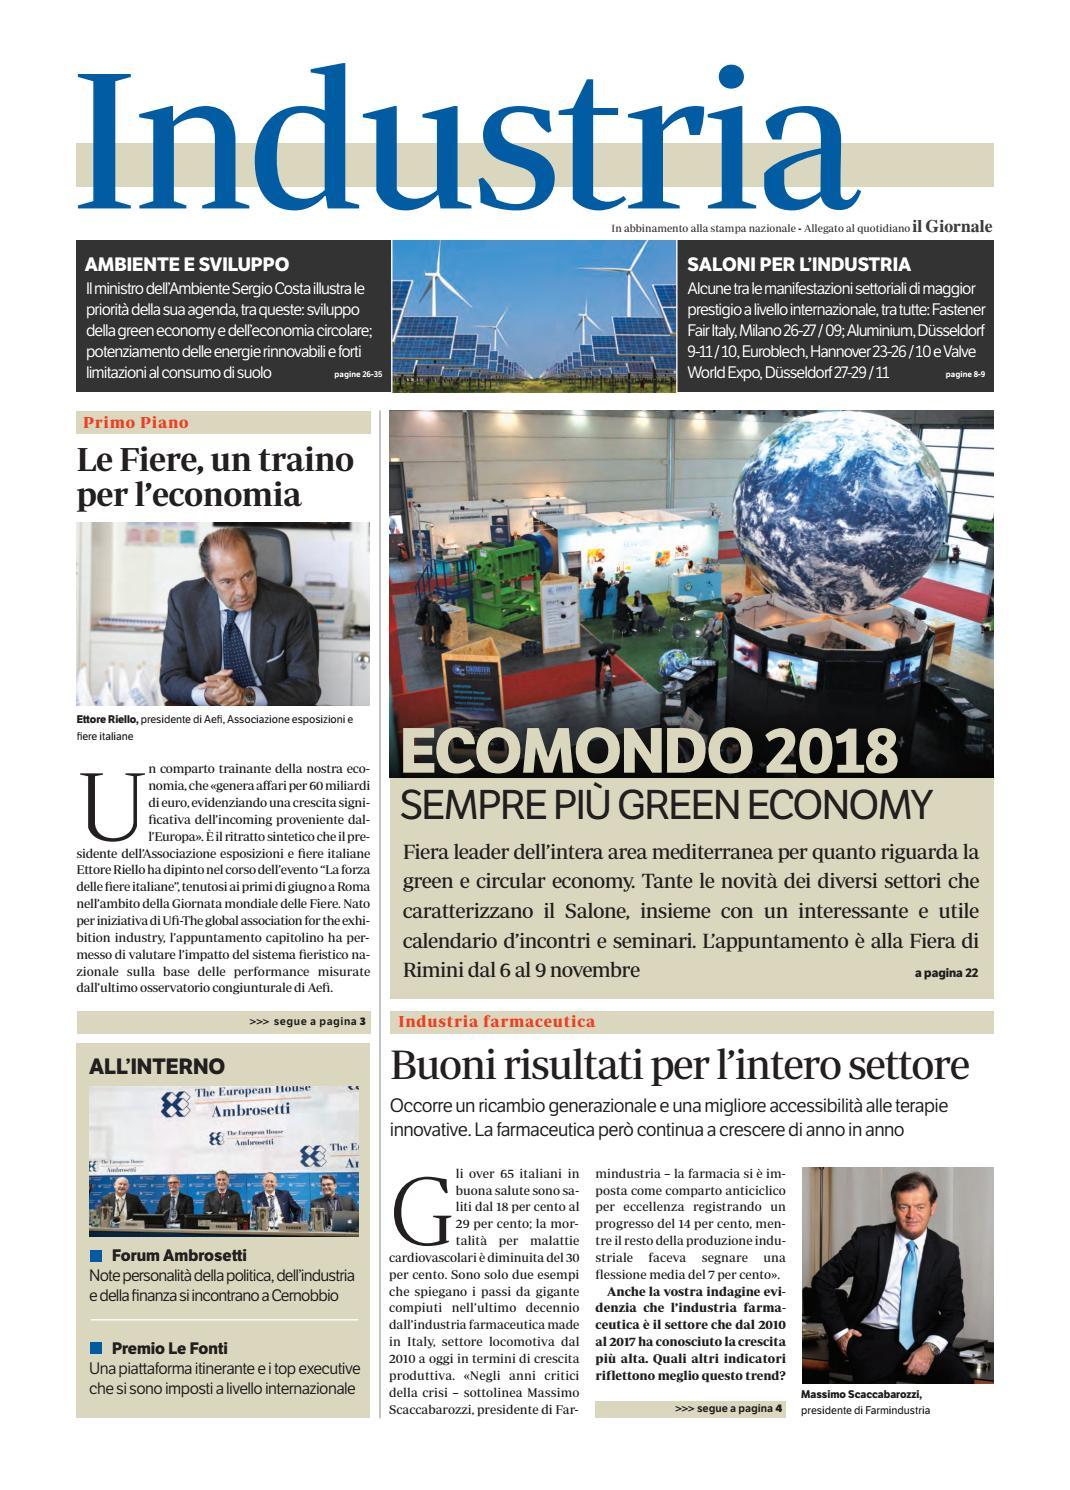 Industria - Ago 2018 by Golfarelli Editore International Group - issuu eaac618eafd8